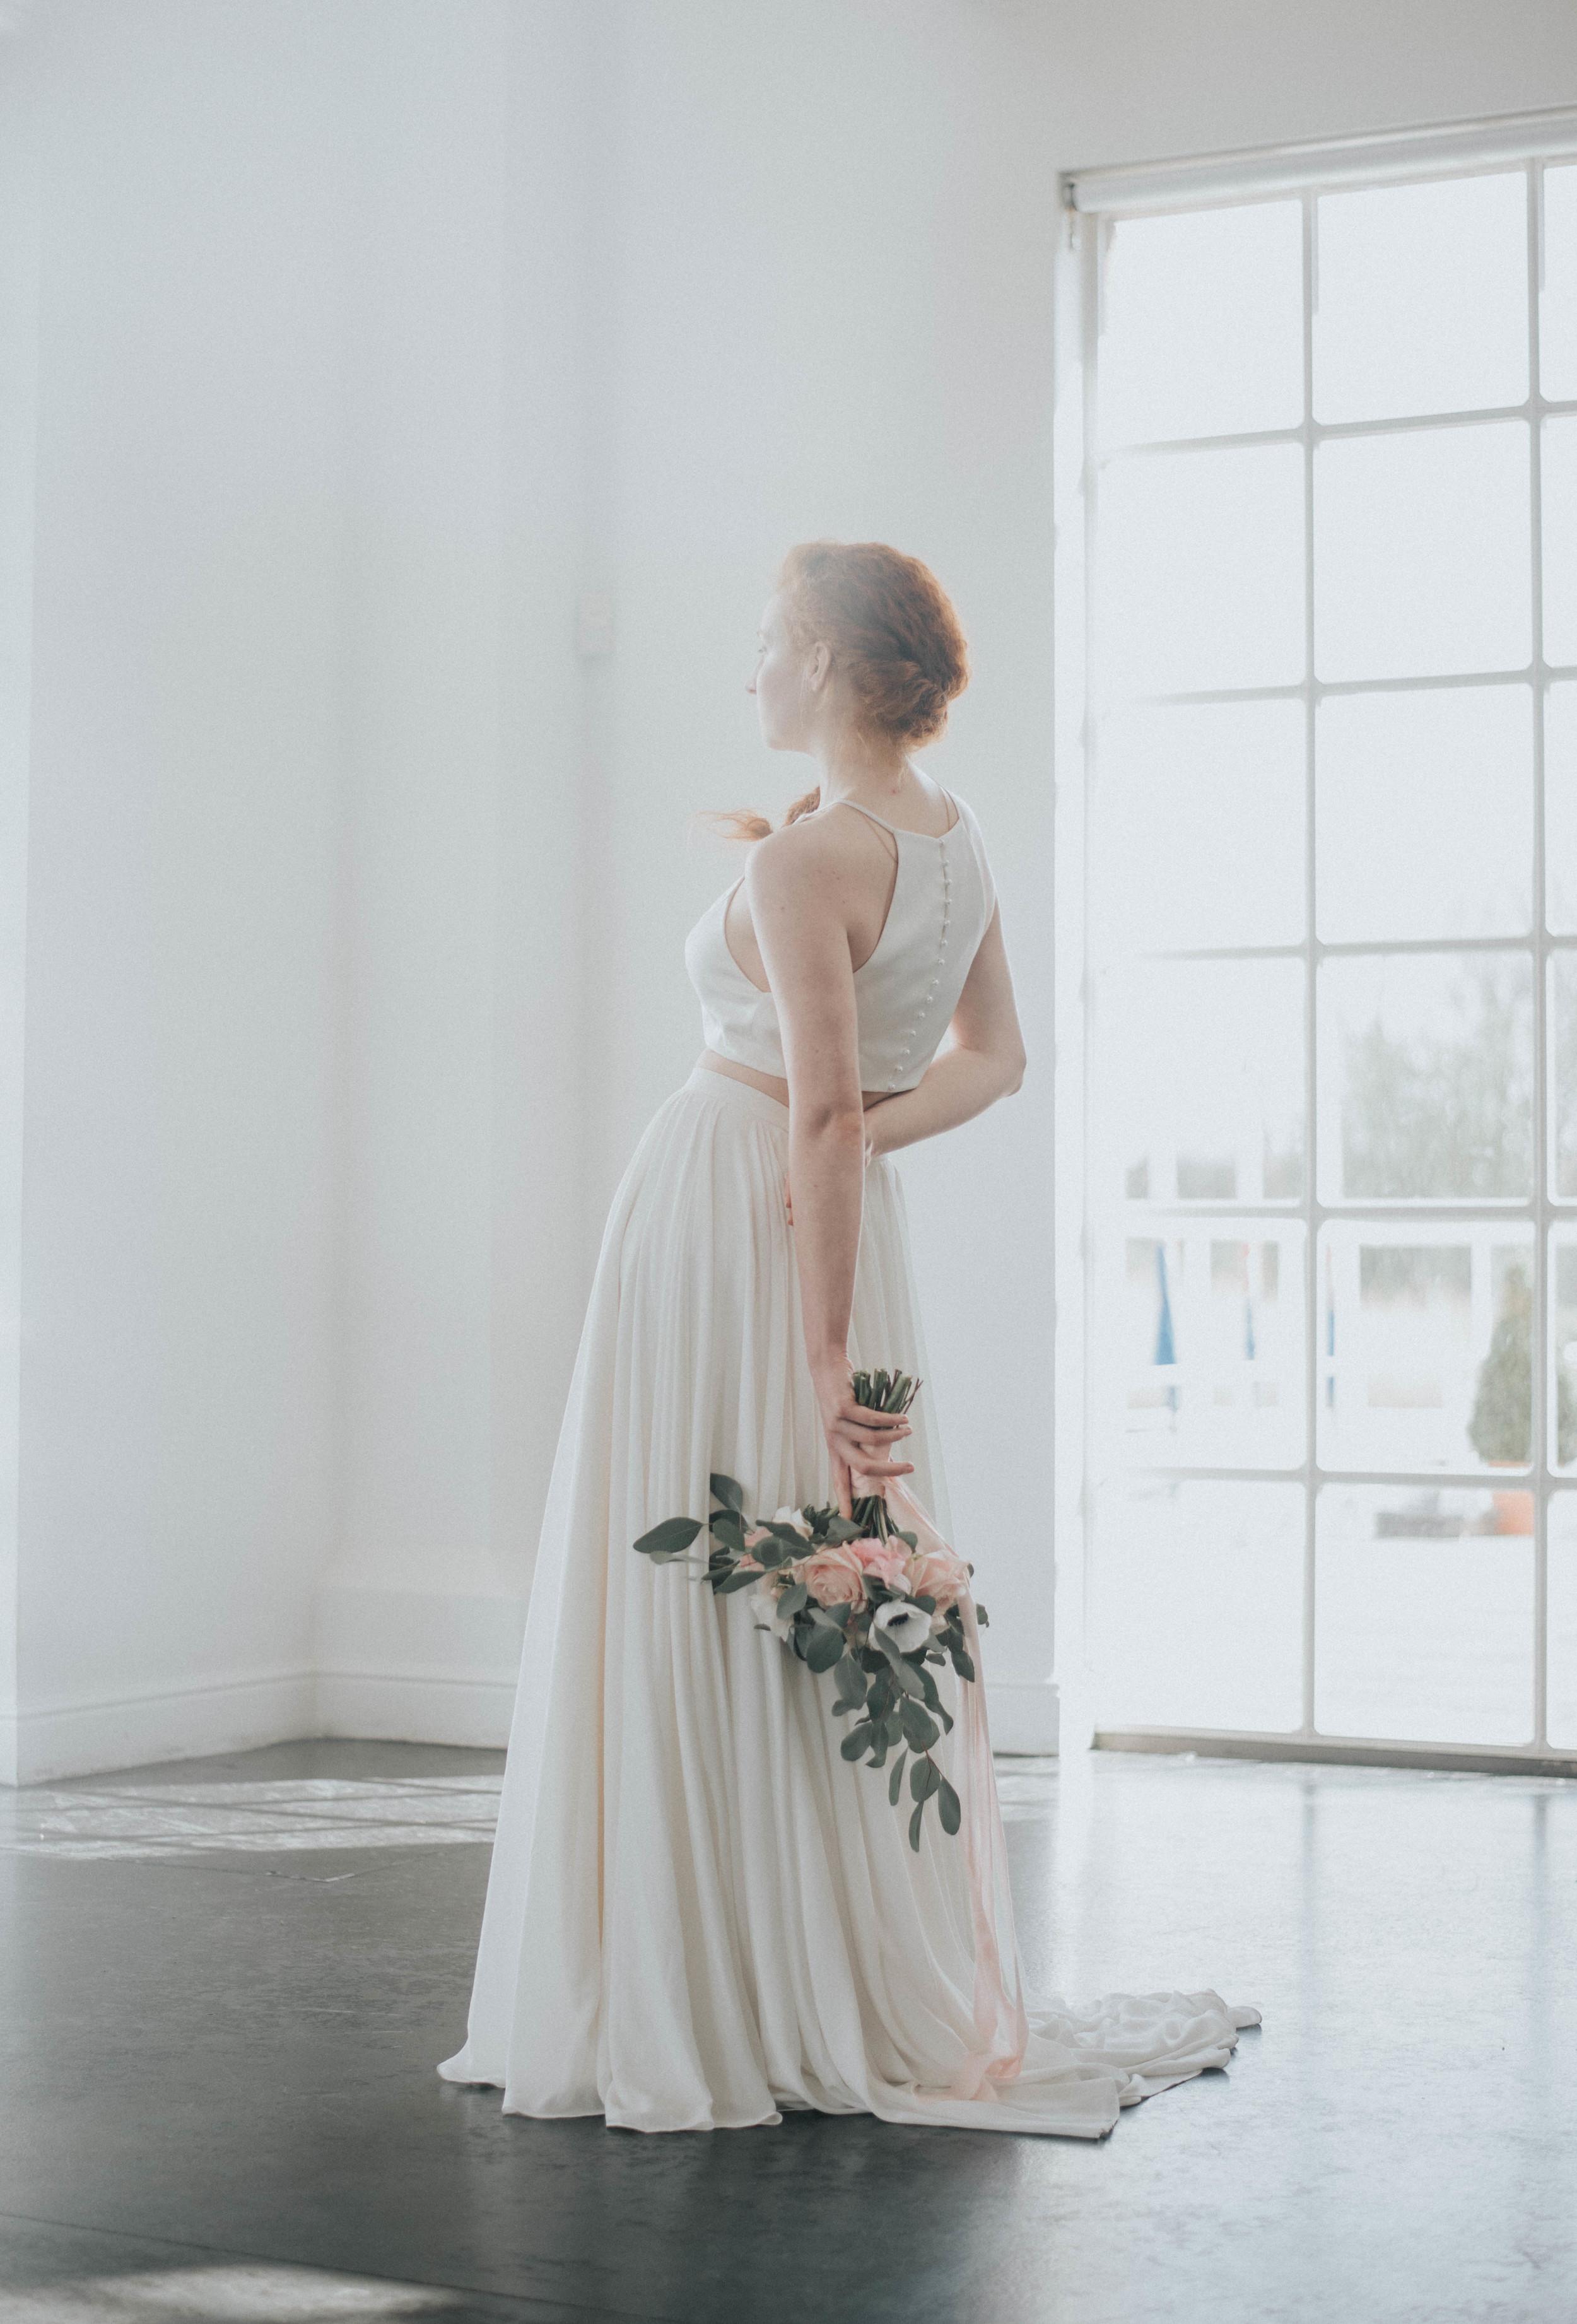 CrystalChic_WeddingInspiration-23.jpg